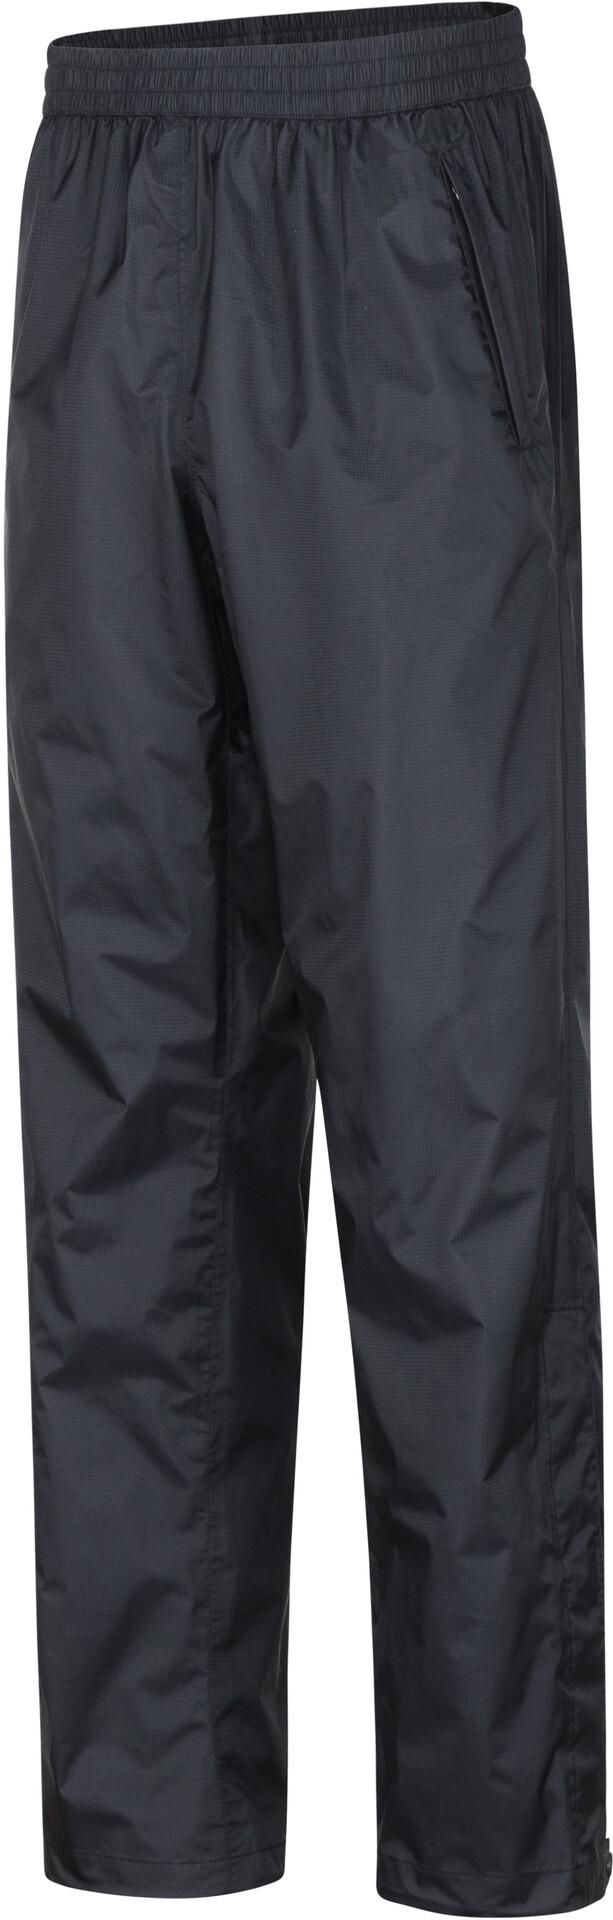 Marmot PreCip Eco Pantaloni lunghi Uomo, black su Addnature koy1k